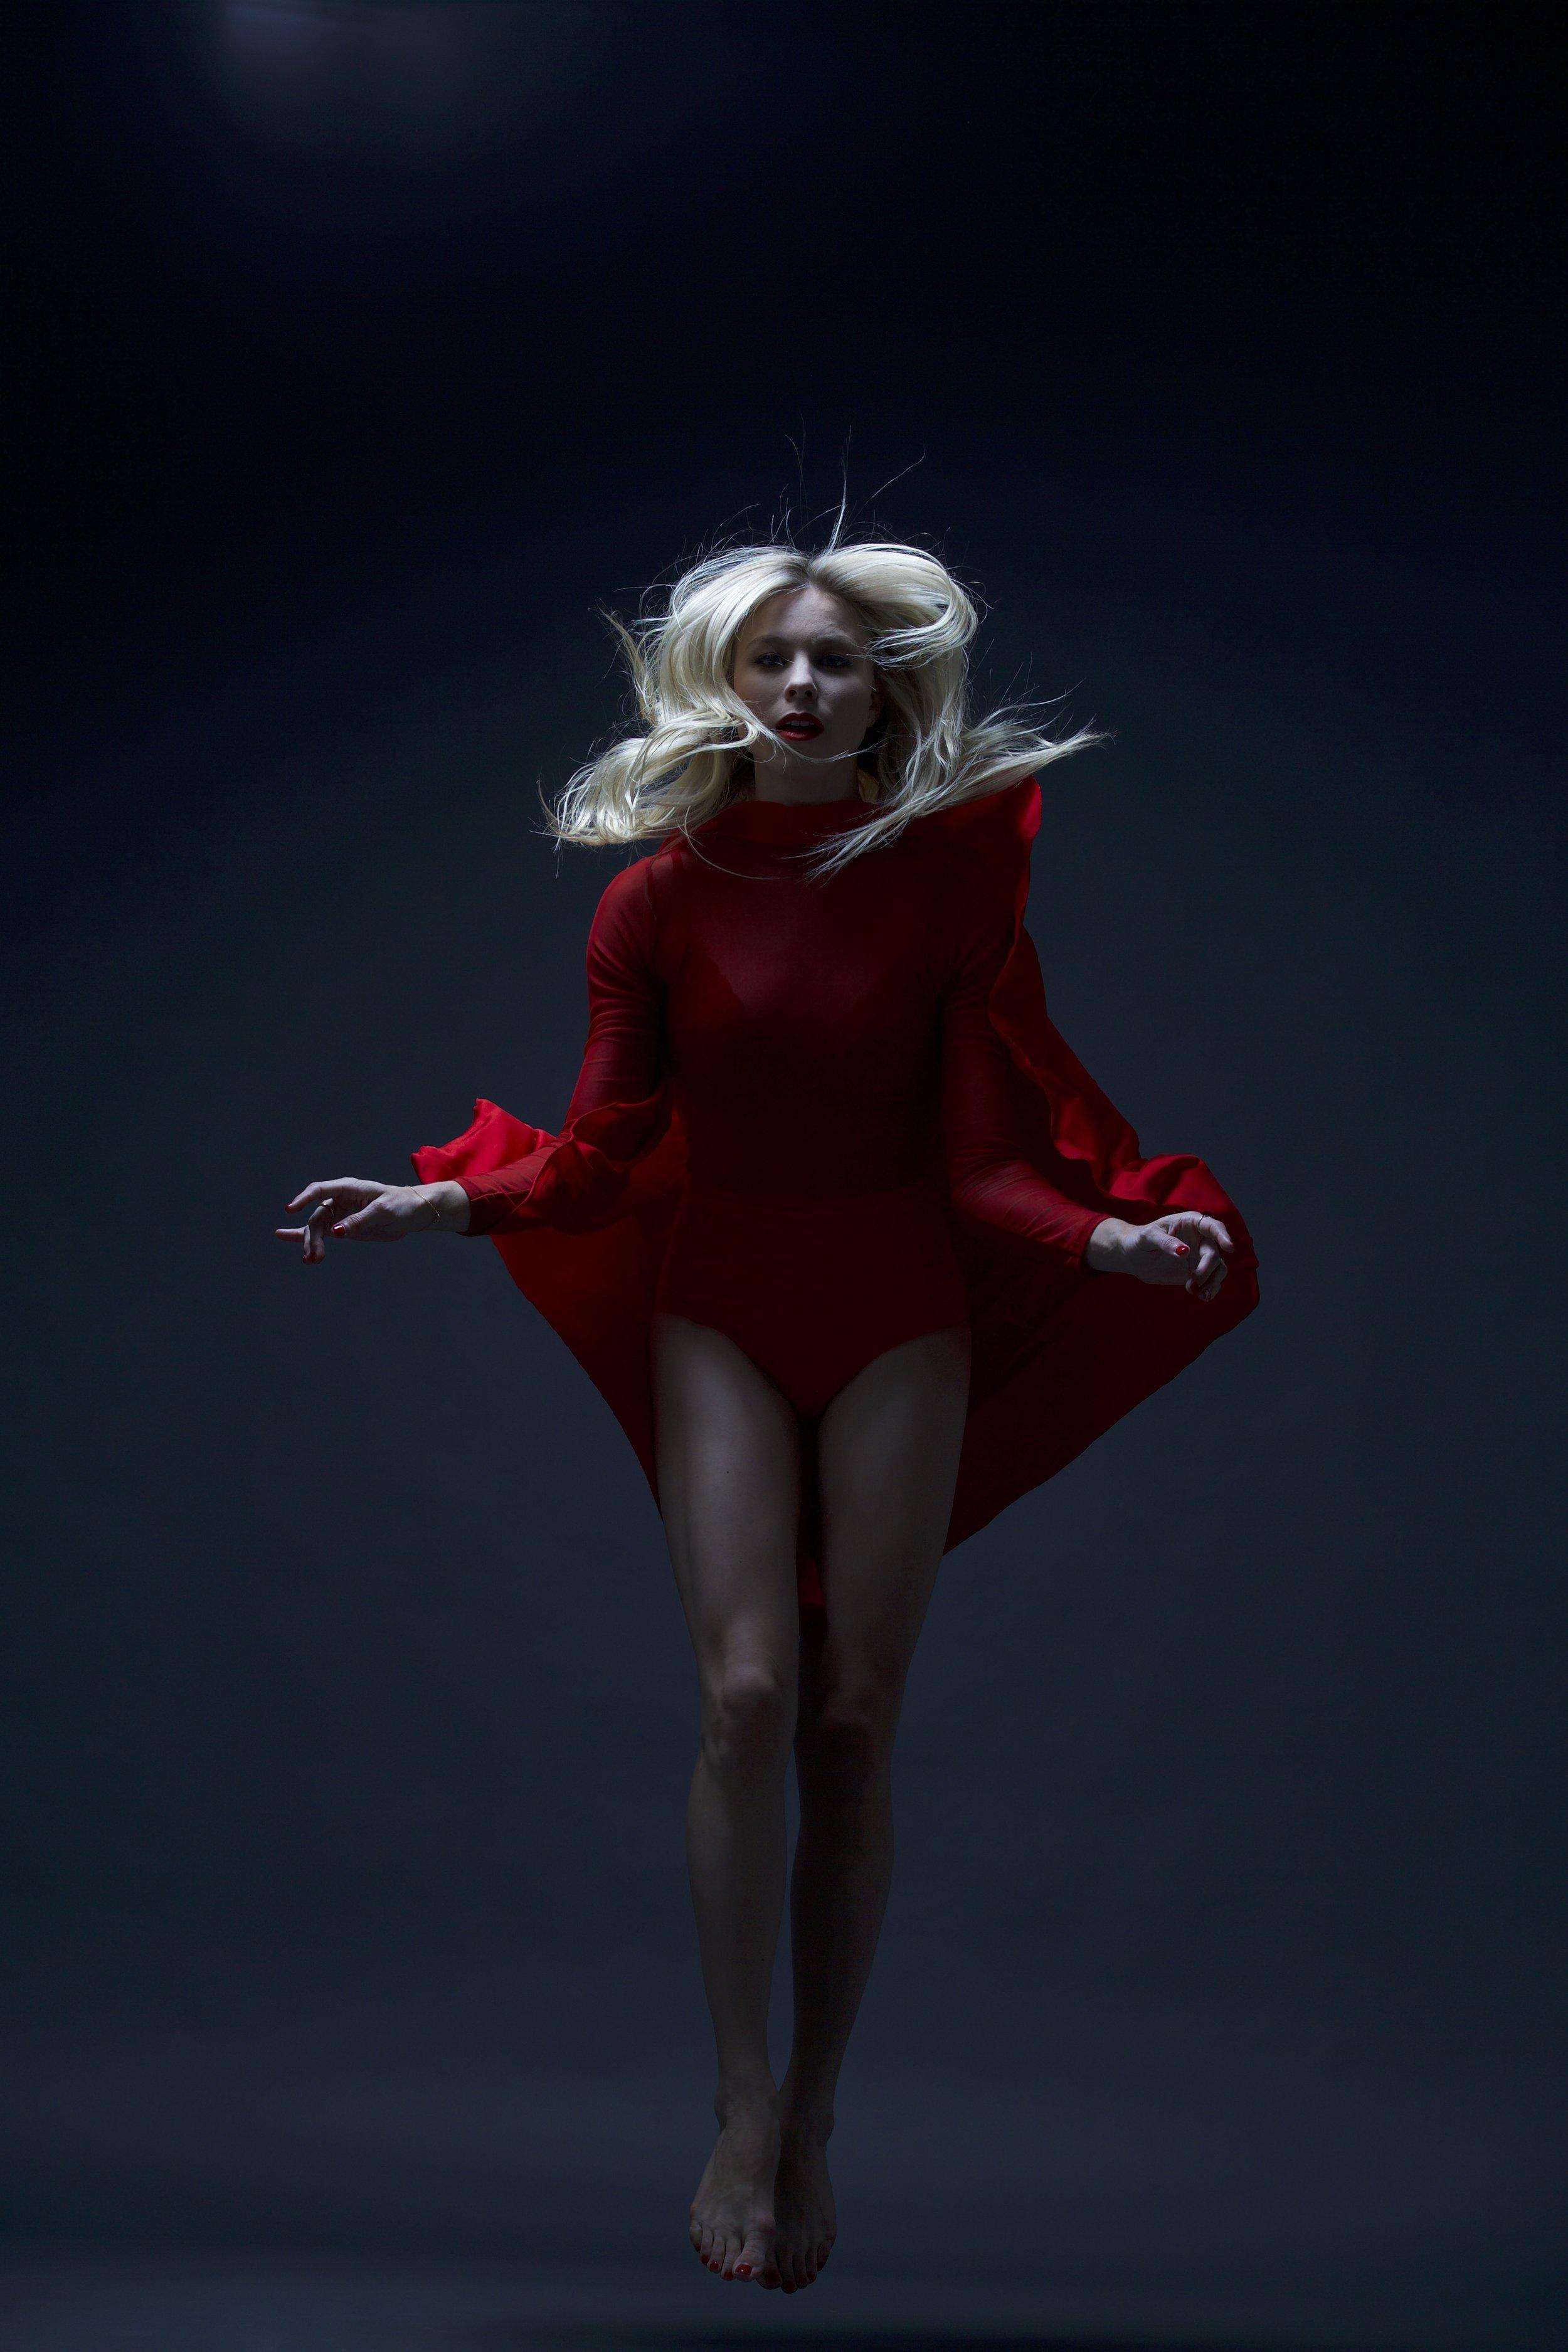 red cape.jpg